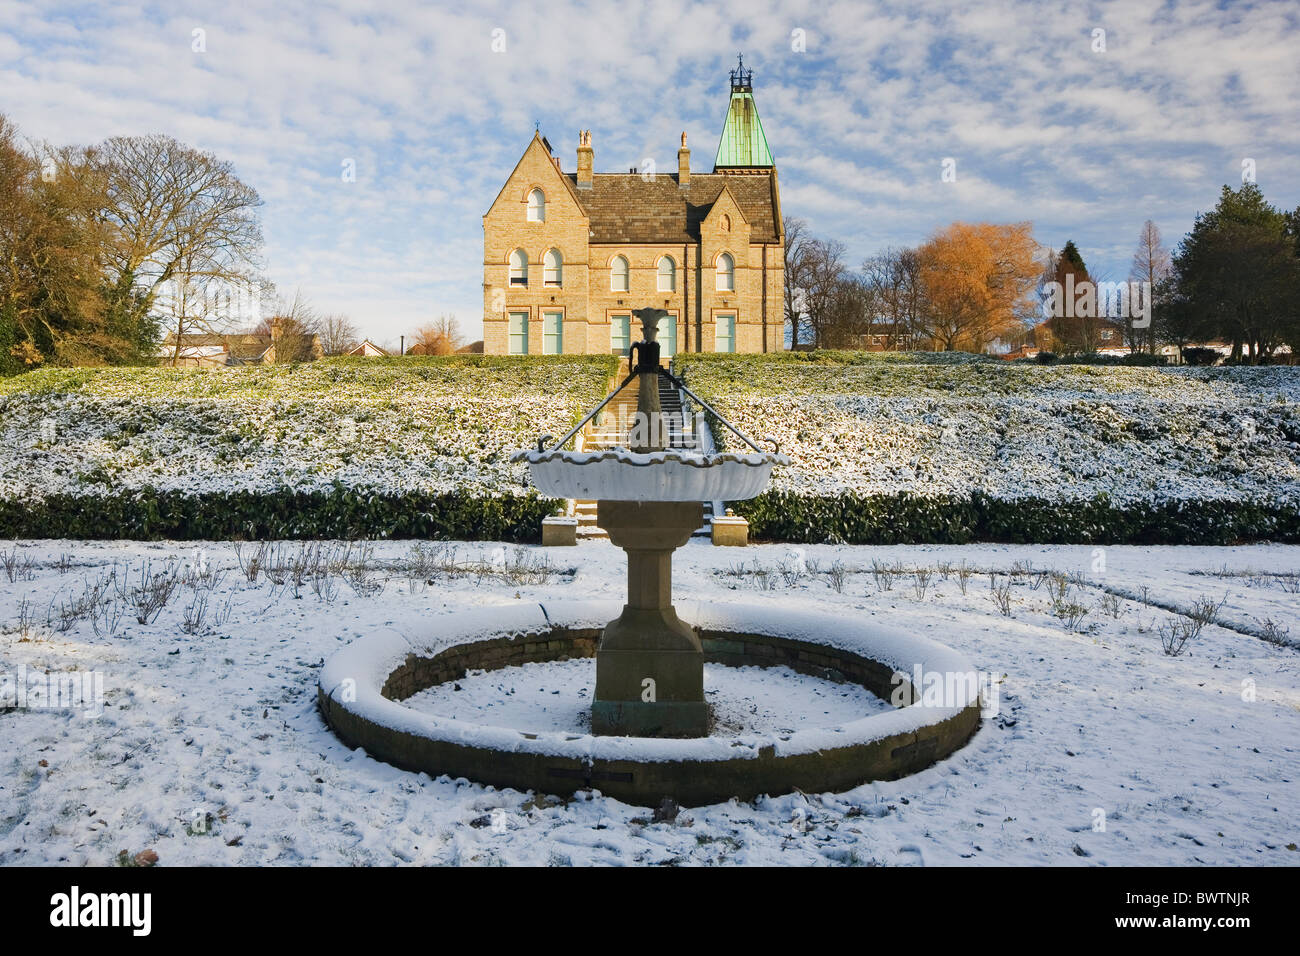 The Bagshaw Museum at Wilton Park Batley West Yorkshire U K